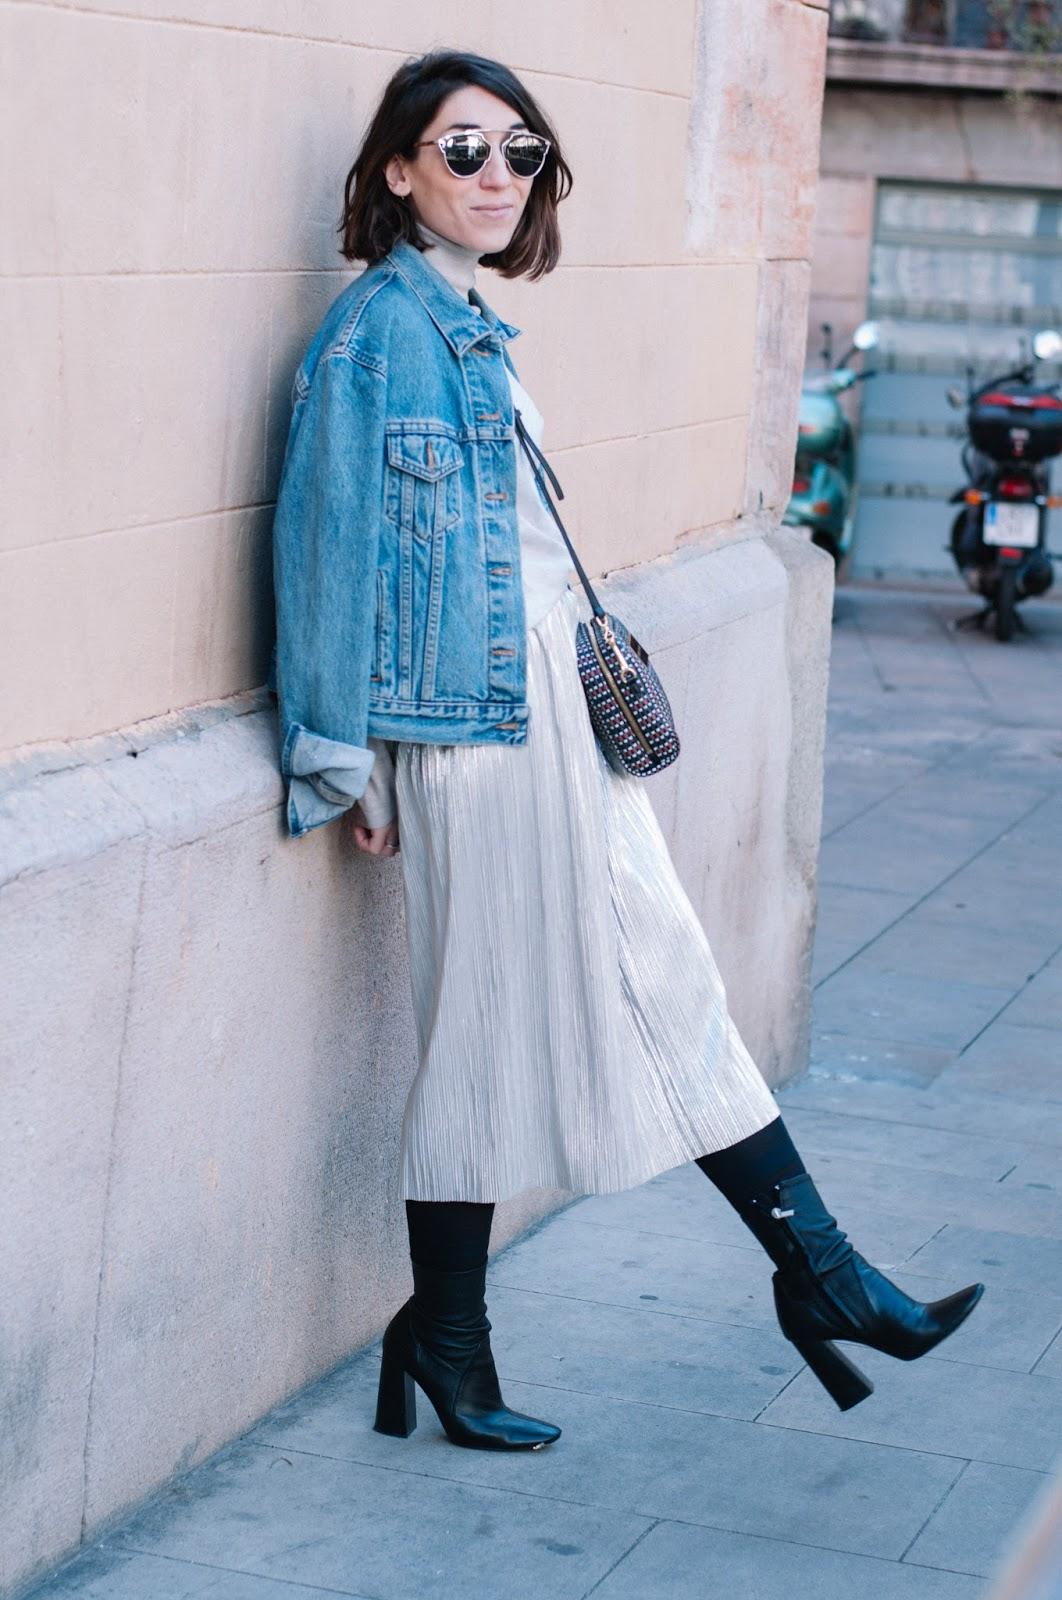 botines, falda Zara, jersey Mango, chaqueta Levi's, bolso Bimba y Lola